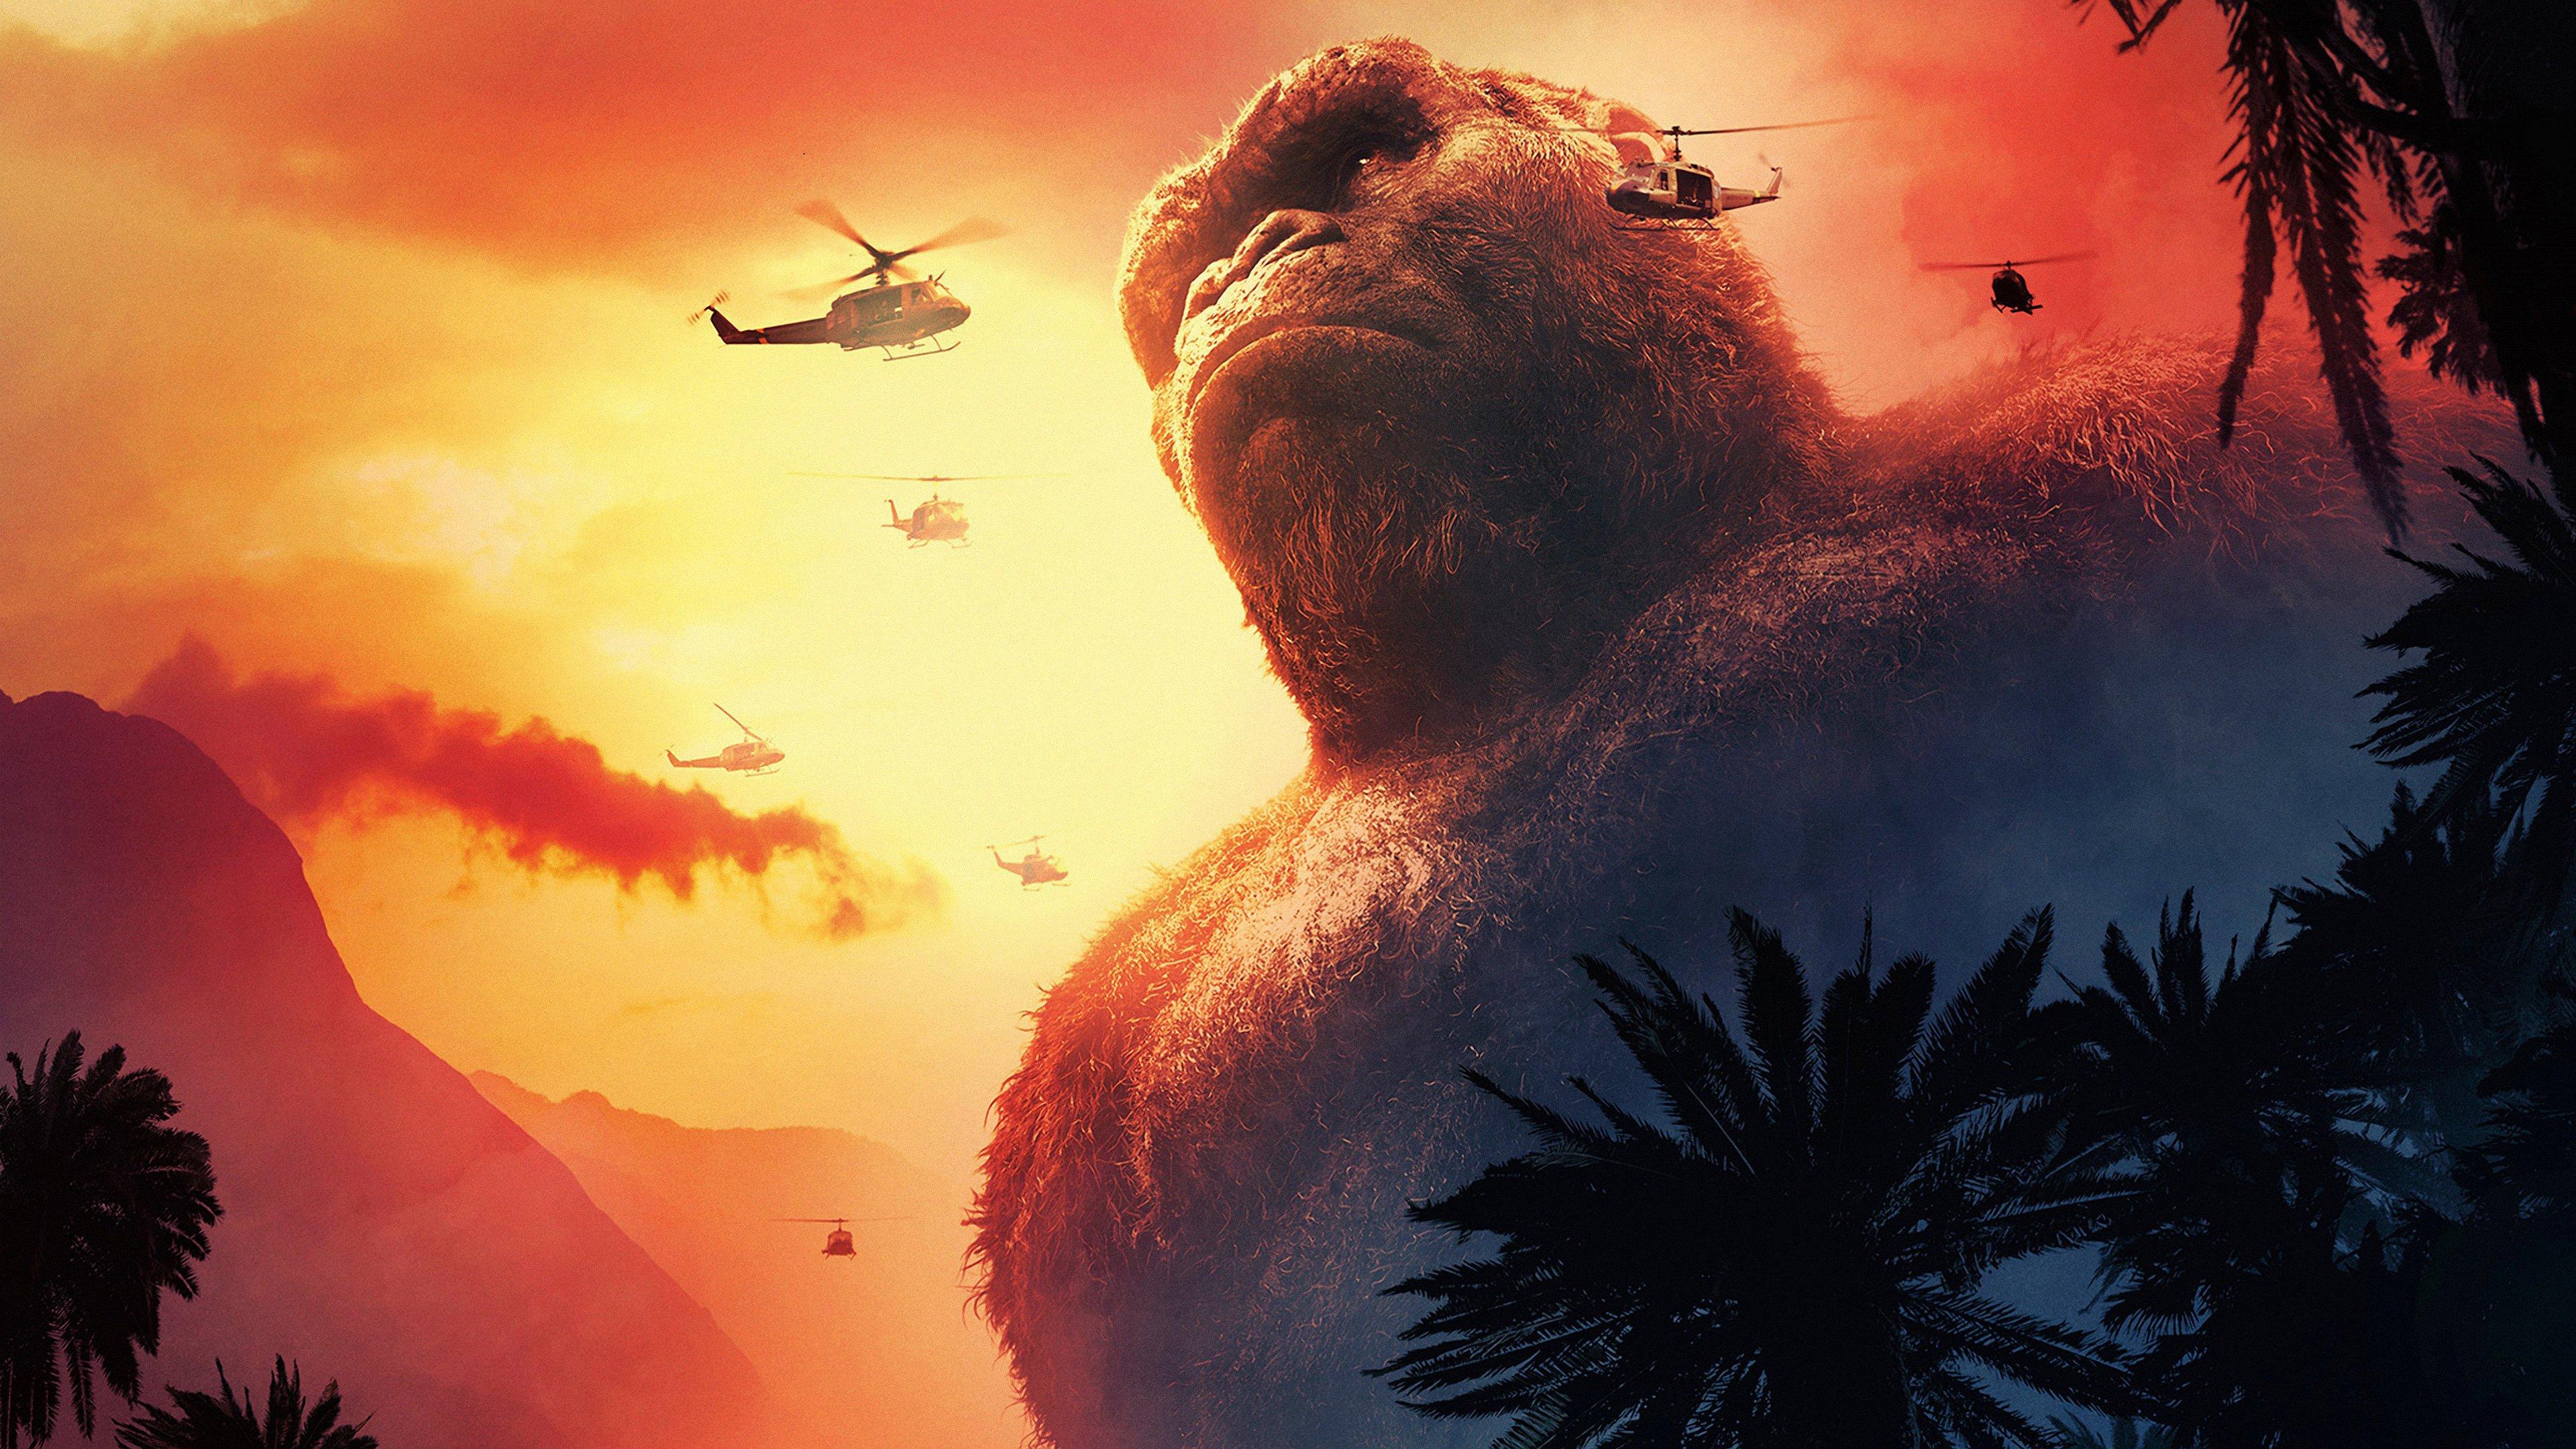 Cartelera: 'Kong: Skull Island' encabeza los estrenos de esta semana